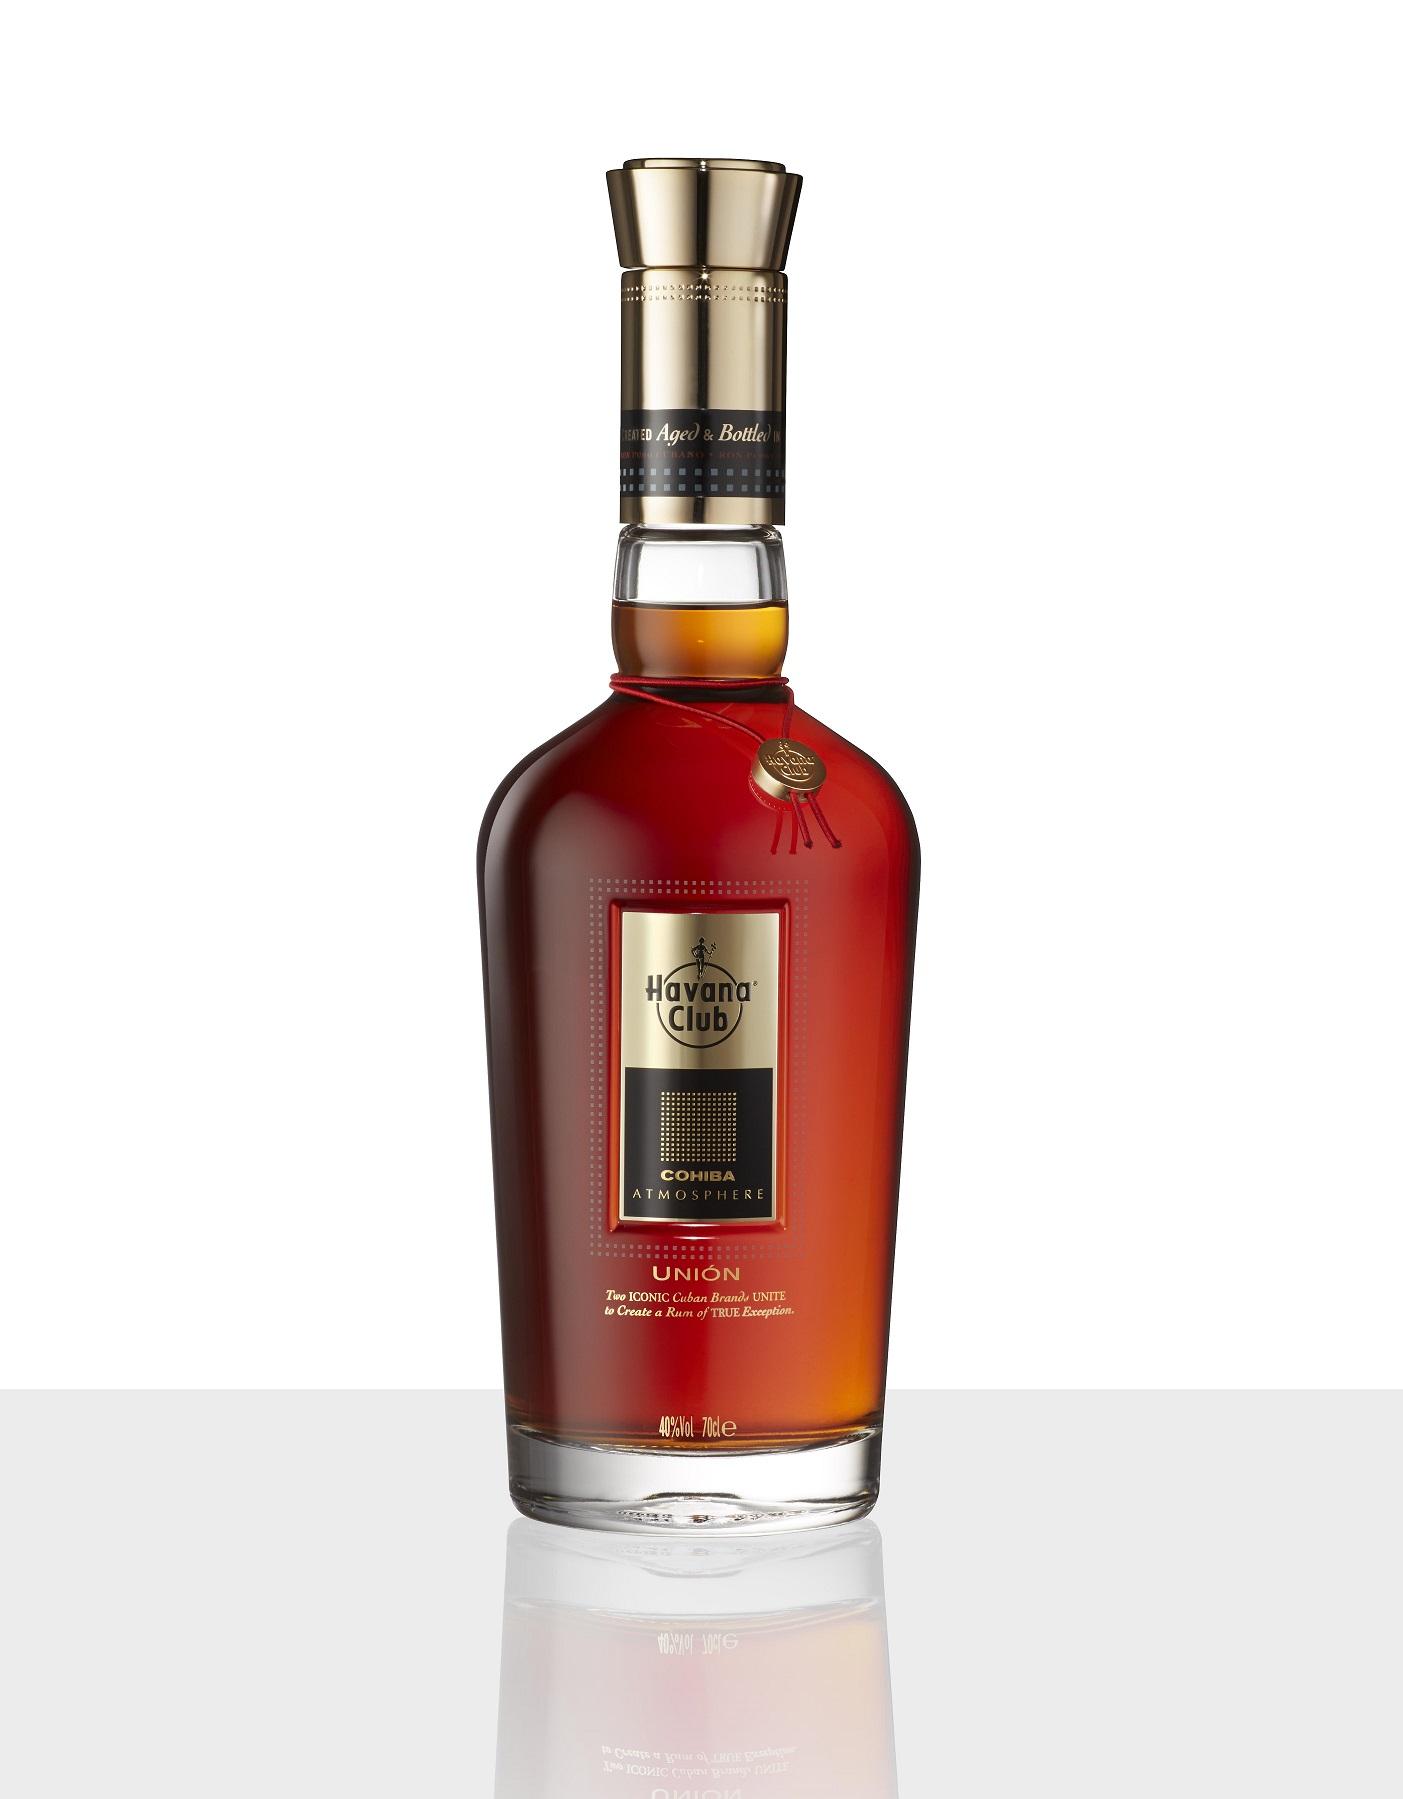 Havana Club Union Rum